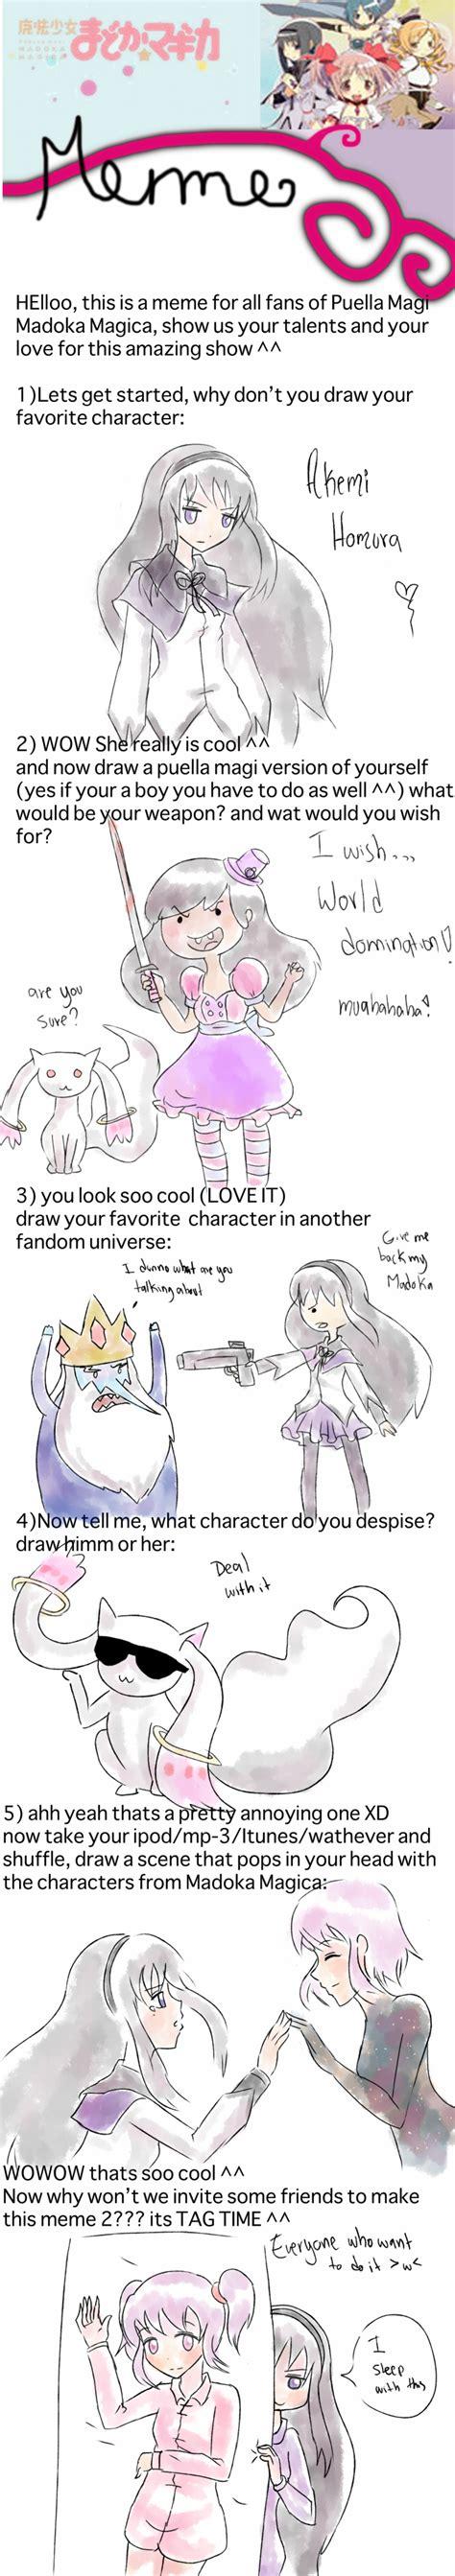 Madoka Magica Memes - puella magi madoka magica meme by sakurayagami on deviantart